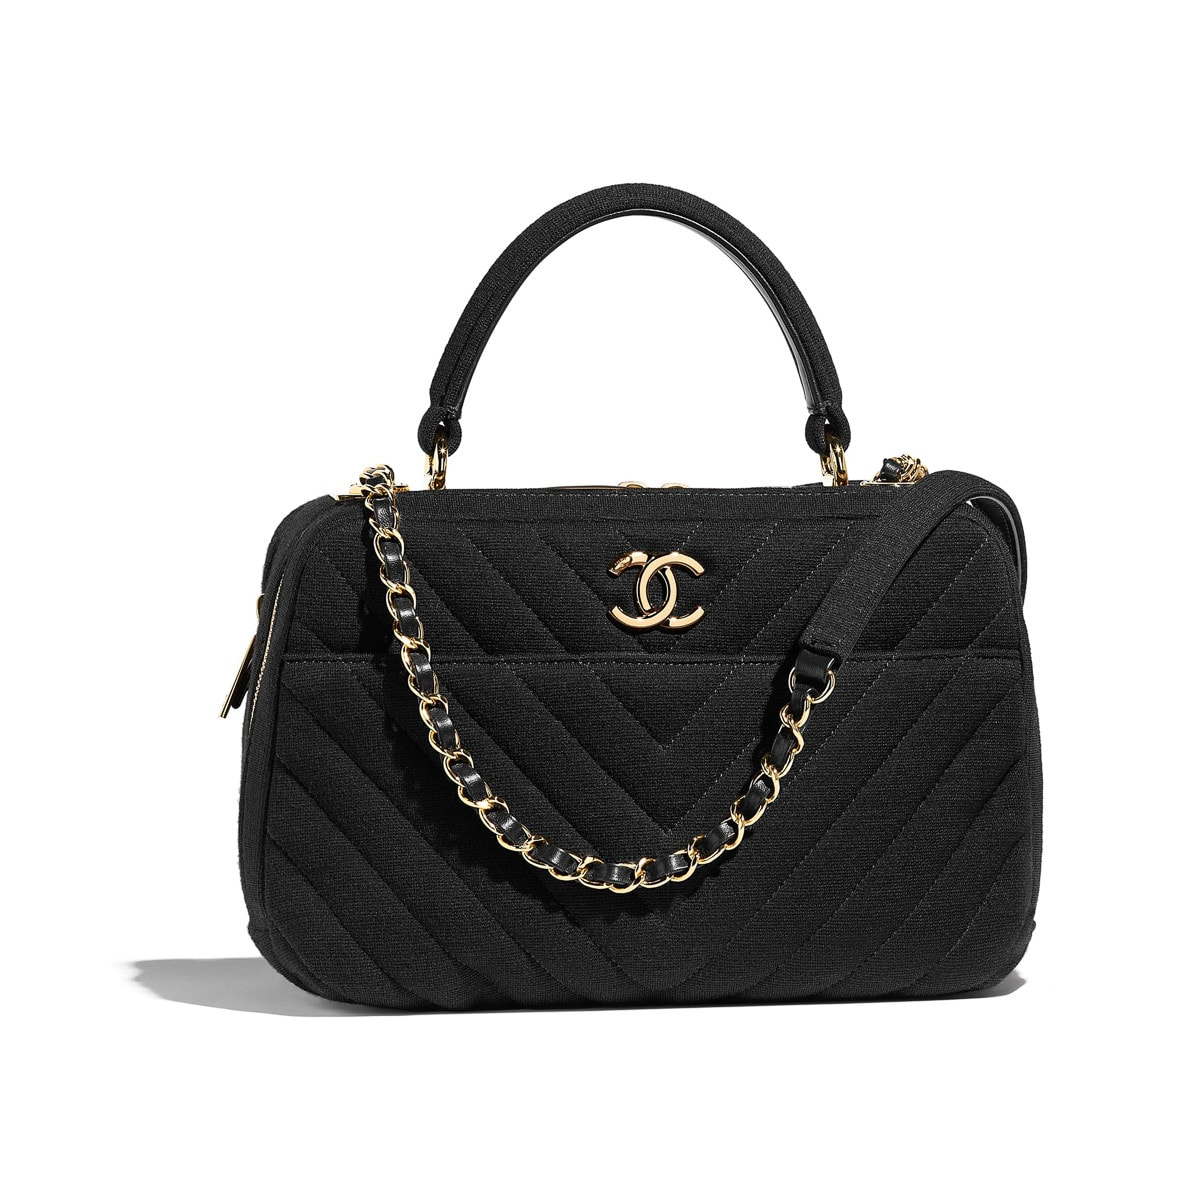 Chanel Bag Malaysia Price 2019 | Jaguar Clubs of North America